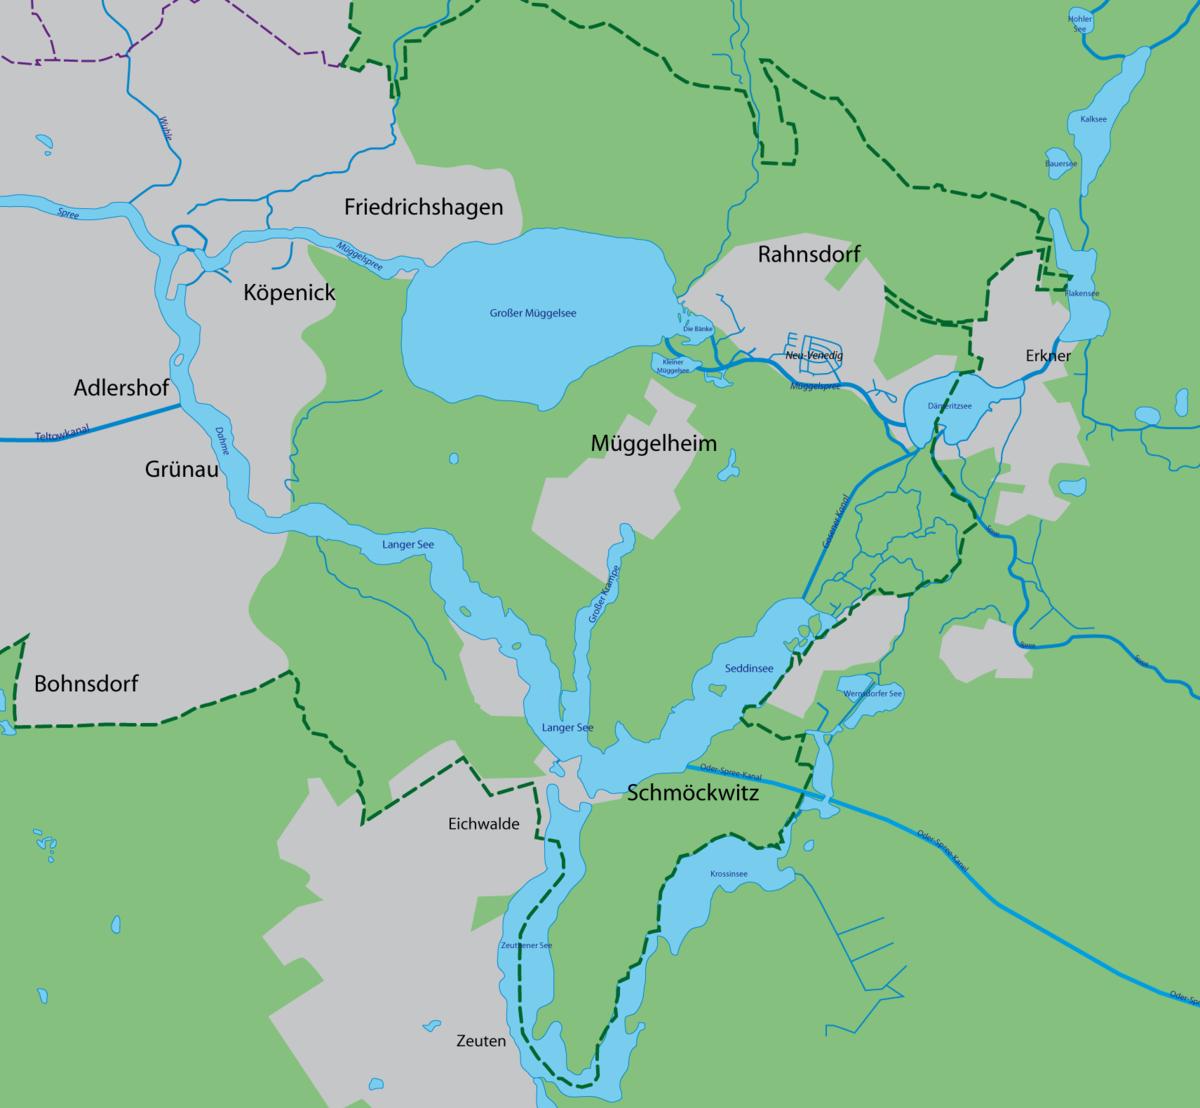 Langer See Wikipedia - Berlin on world map